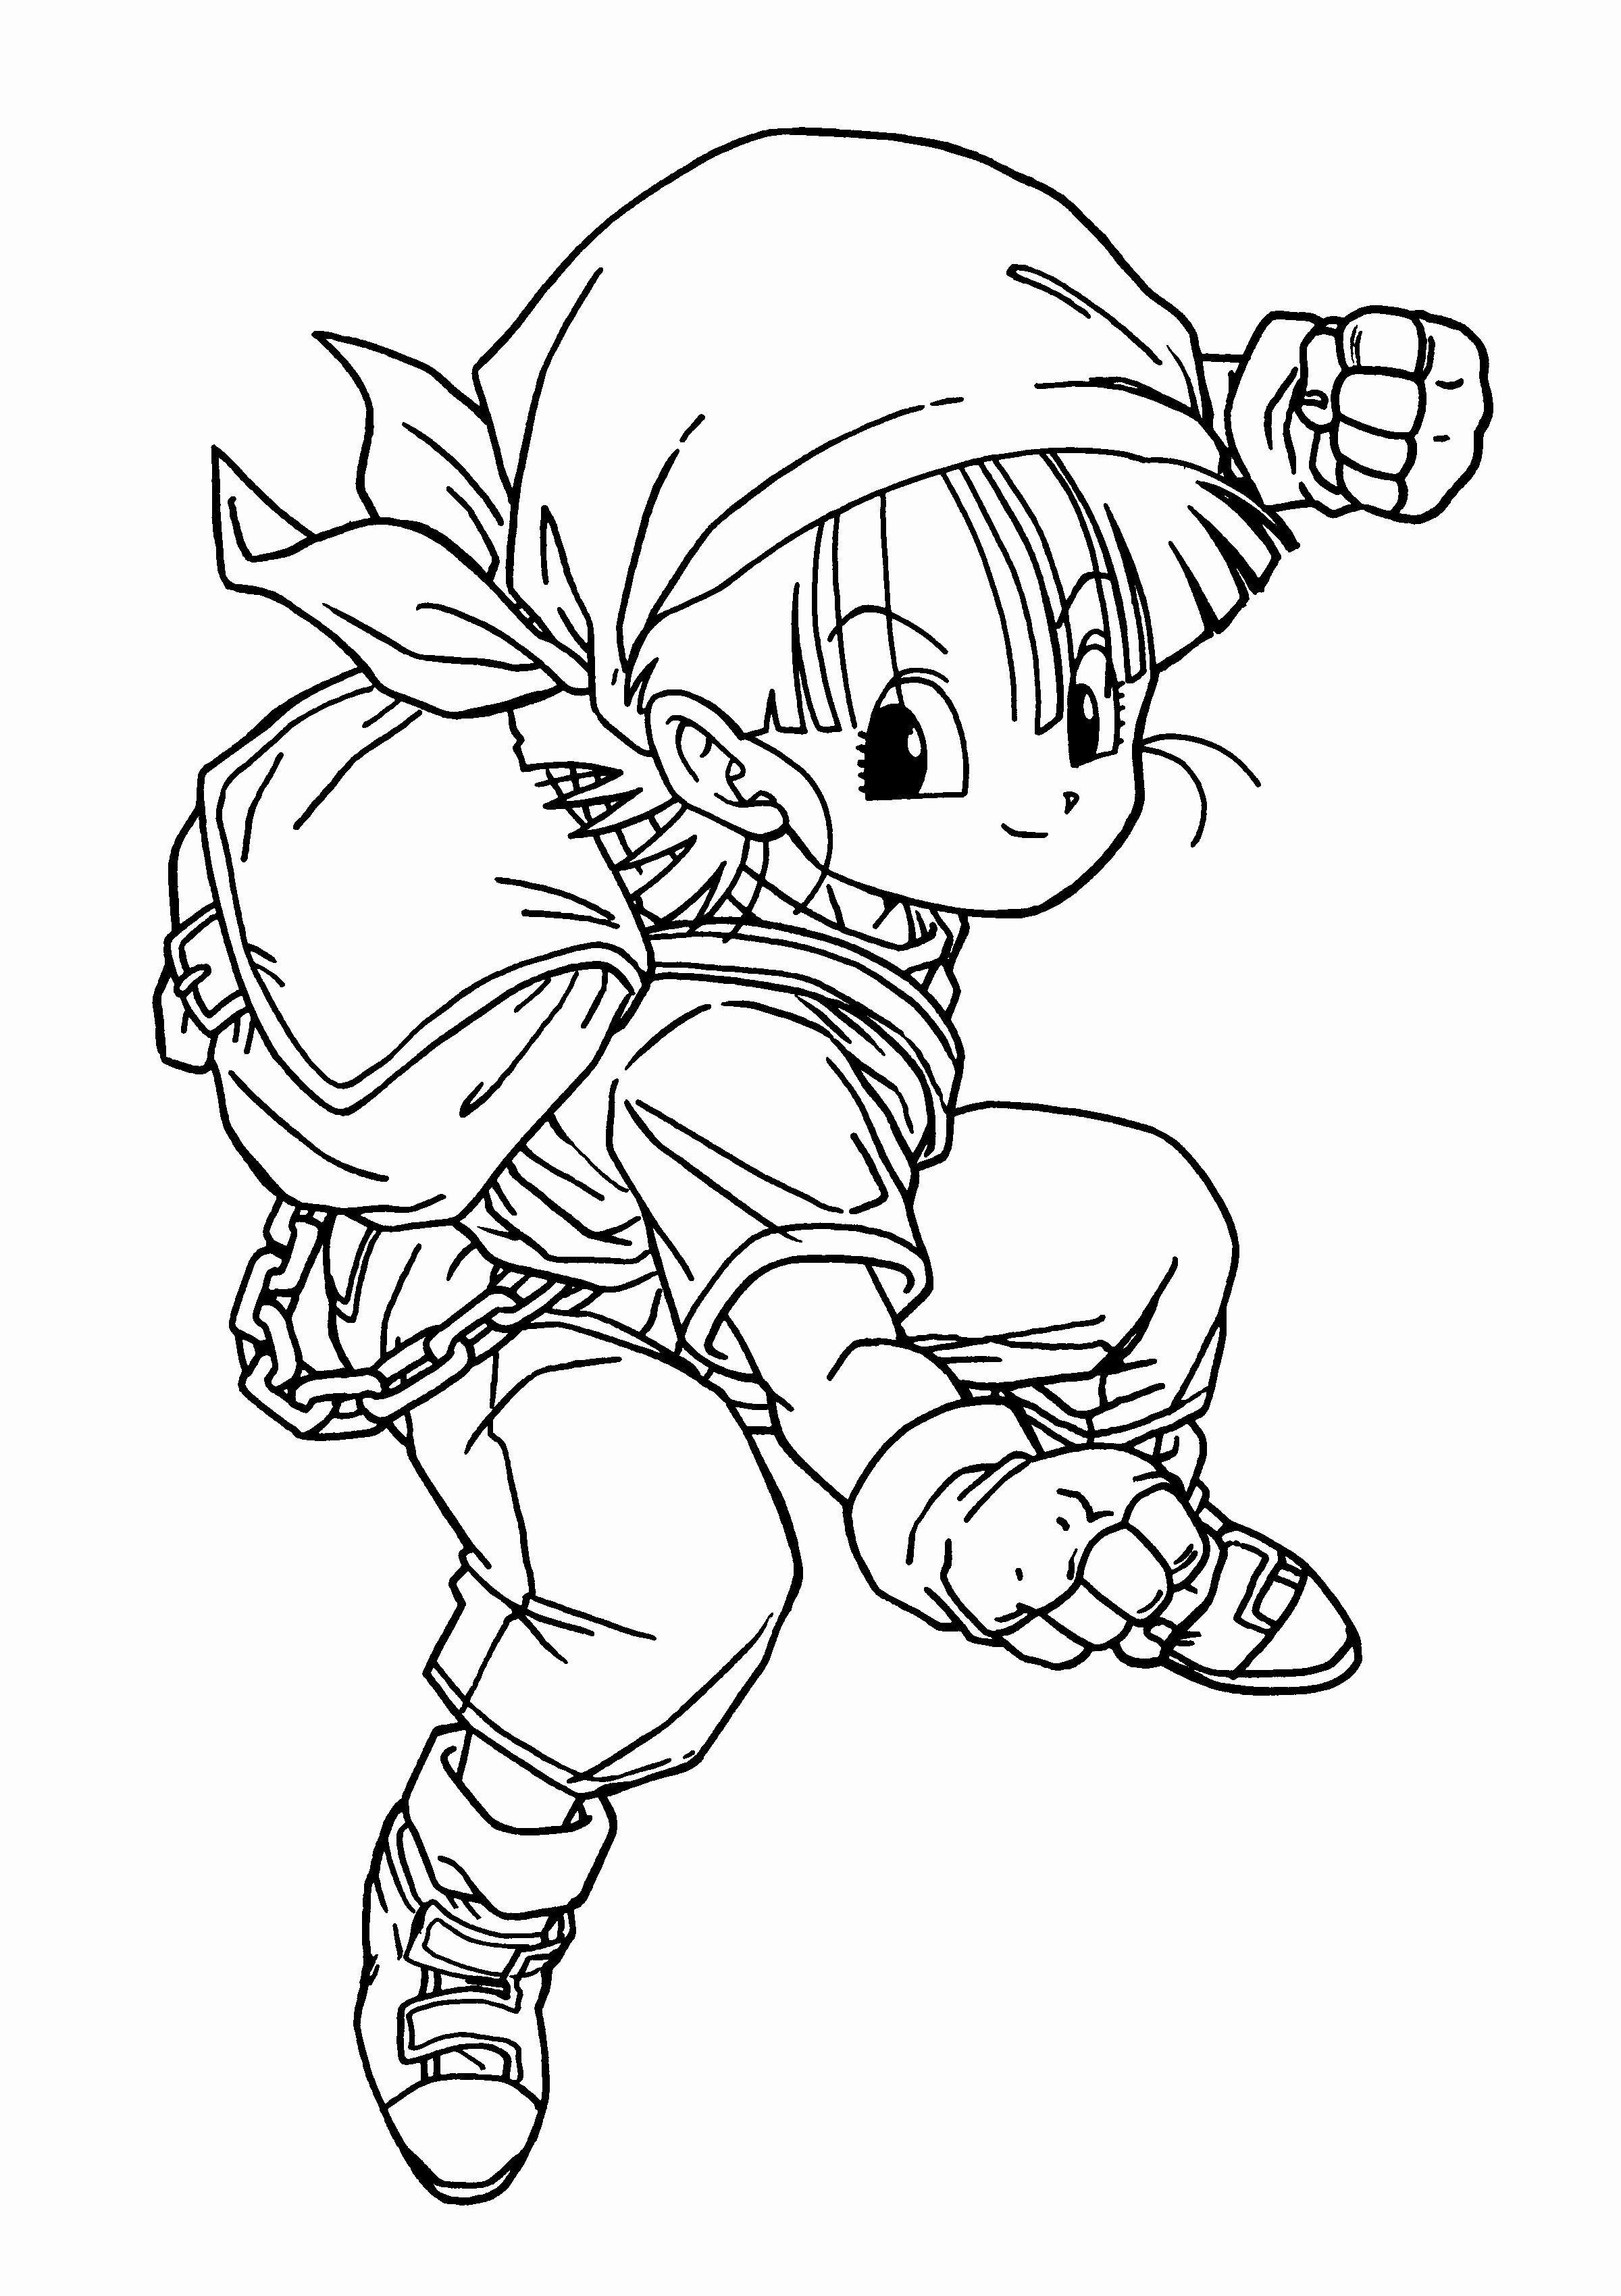 Dragon Ball Drawing Book Inspirational Elegant Dragon Ball Z Coloring Book In 2020 Dragon Ball Image Coloring Pages Dragon Drawing